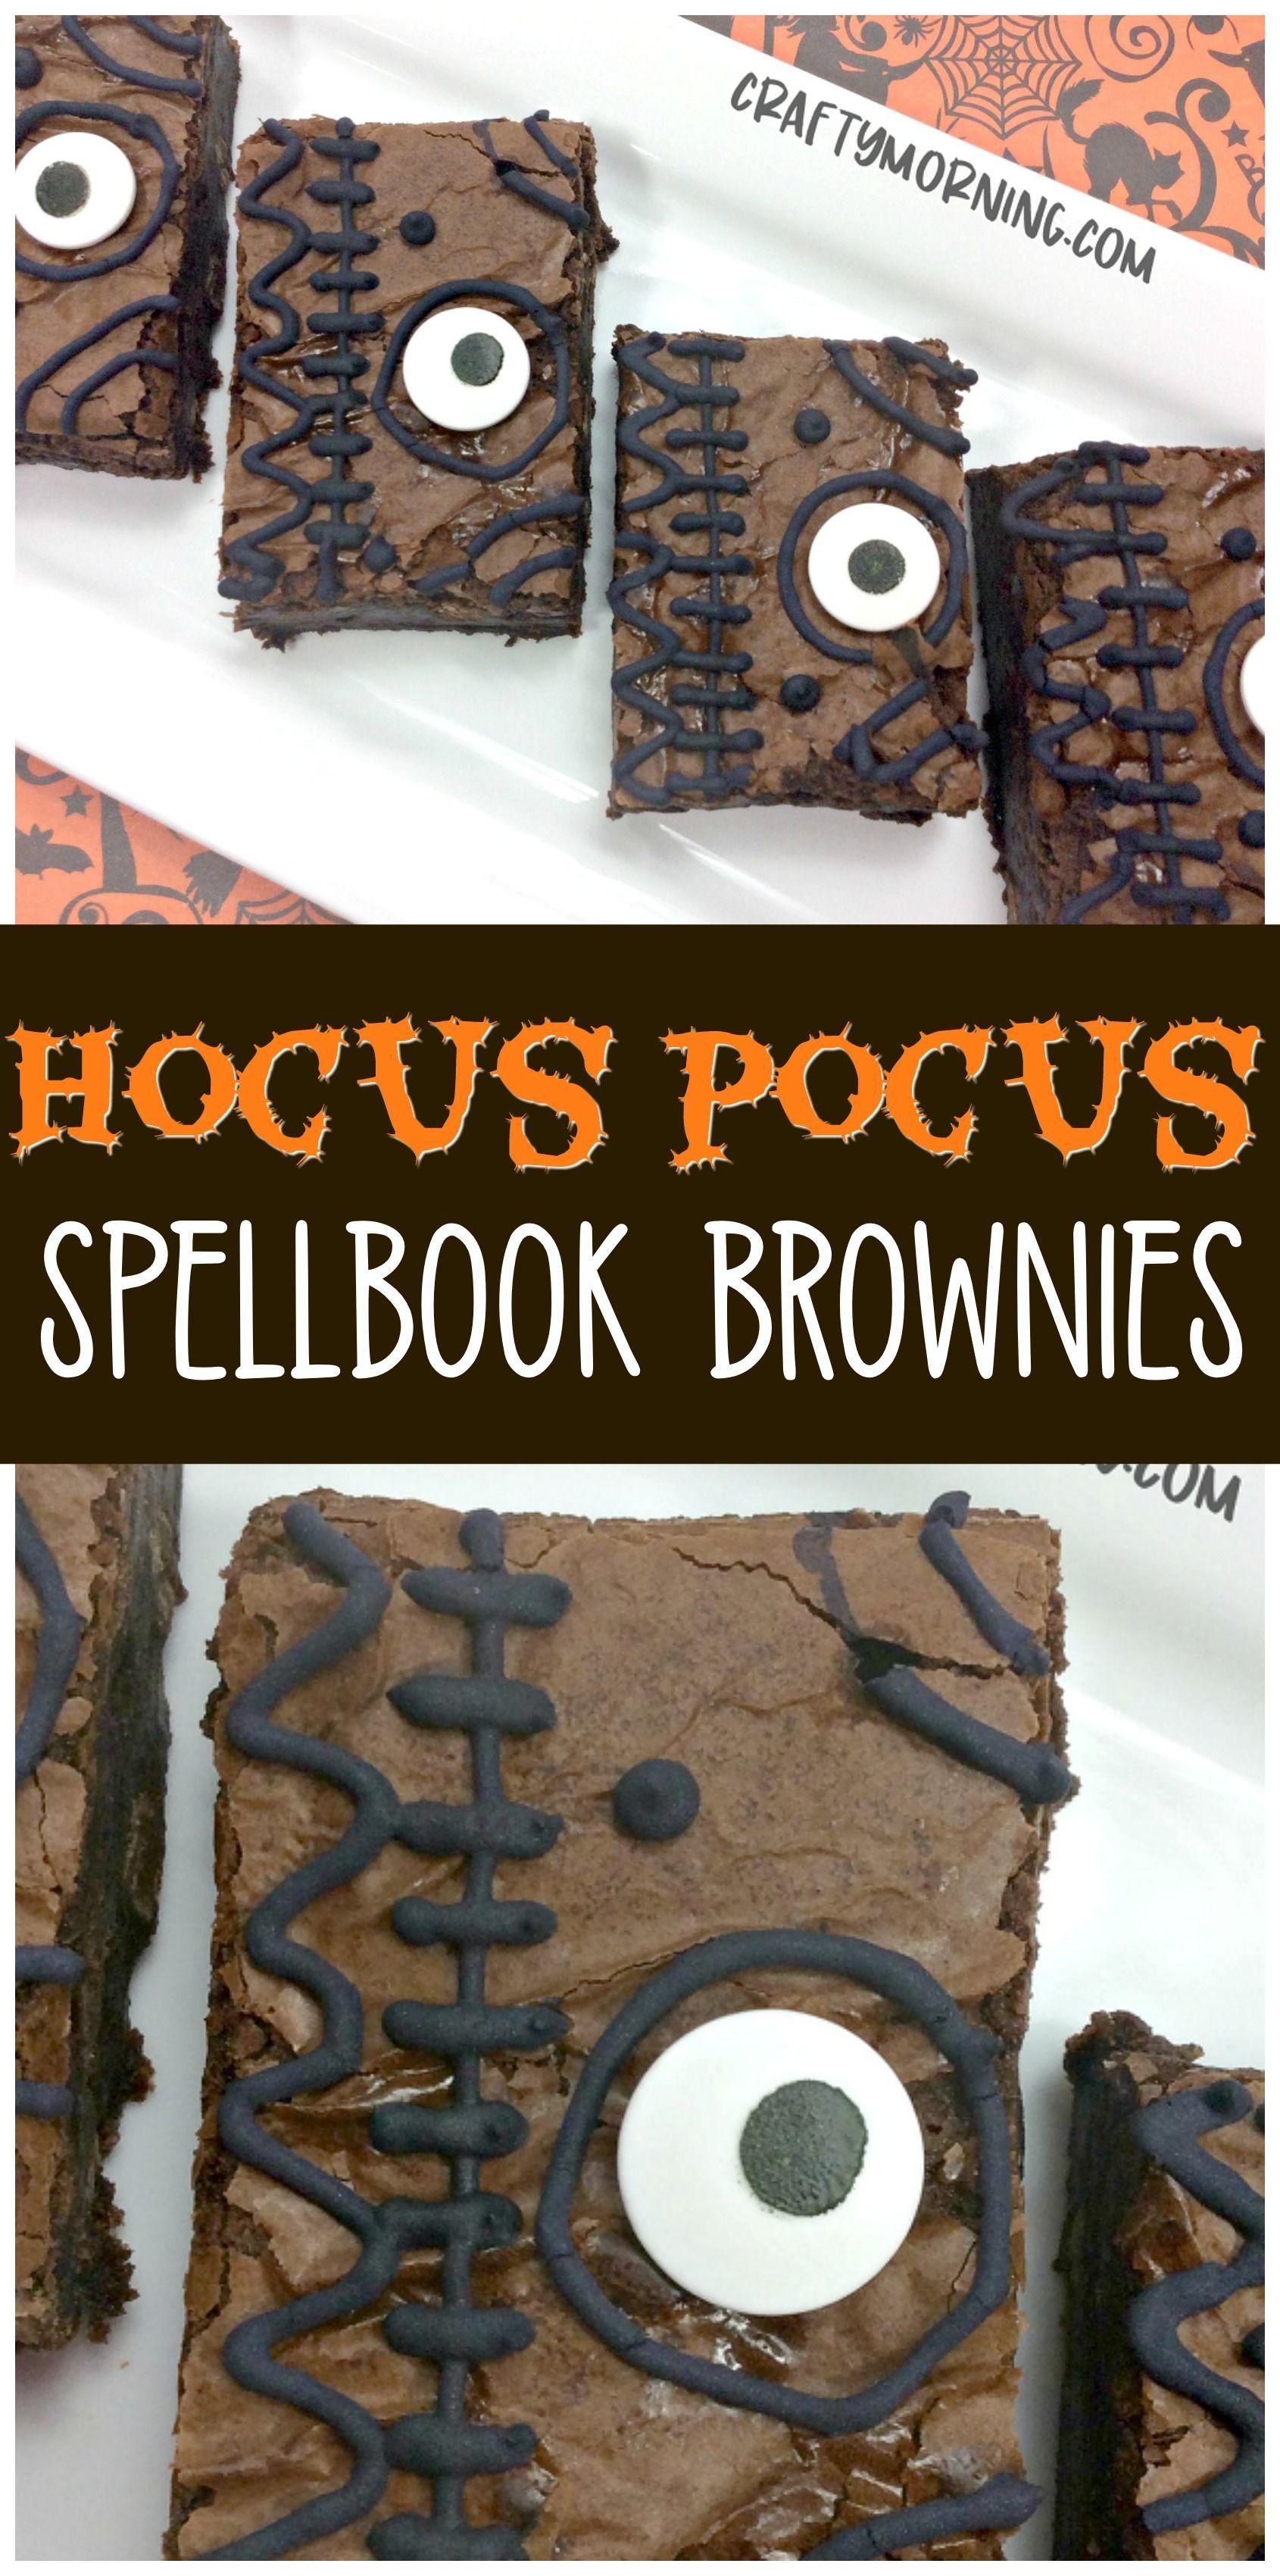 Make fun hocus pocus spellbook brownies for a halloween treat/dessert for the ki... Make fun hocus